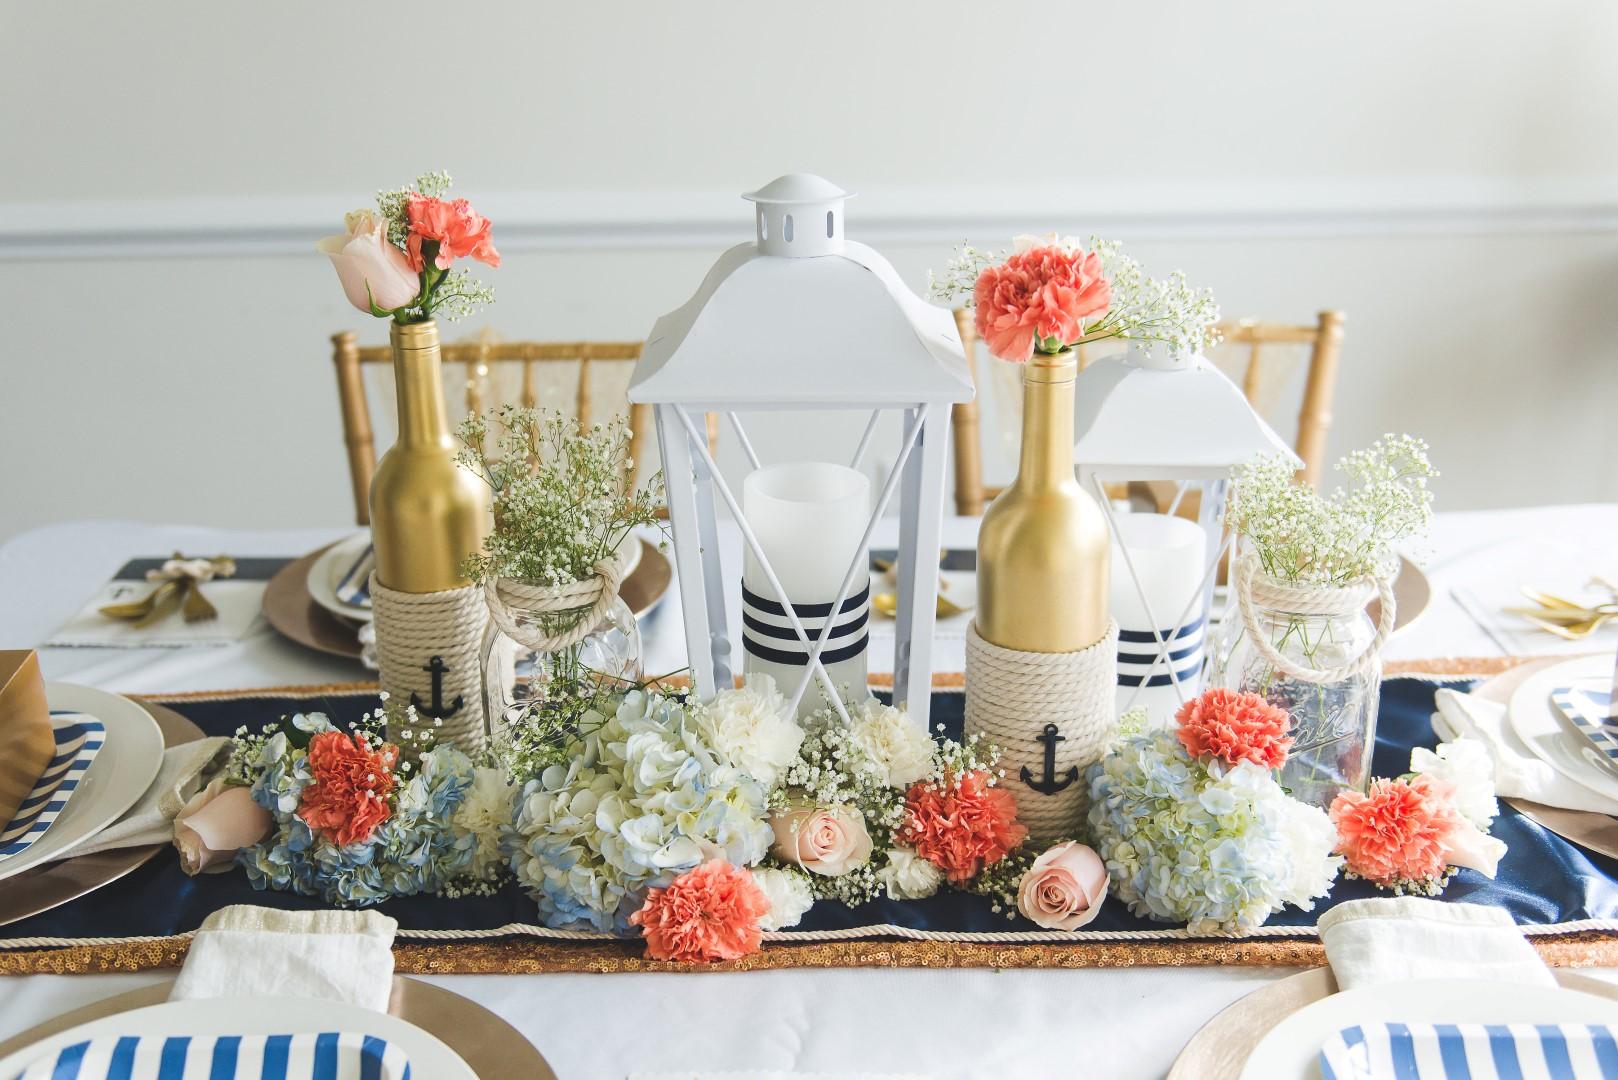 DIY Bride: Elegant Nautical Wedding Centerpiece Tutorial